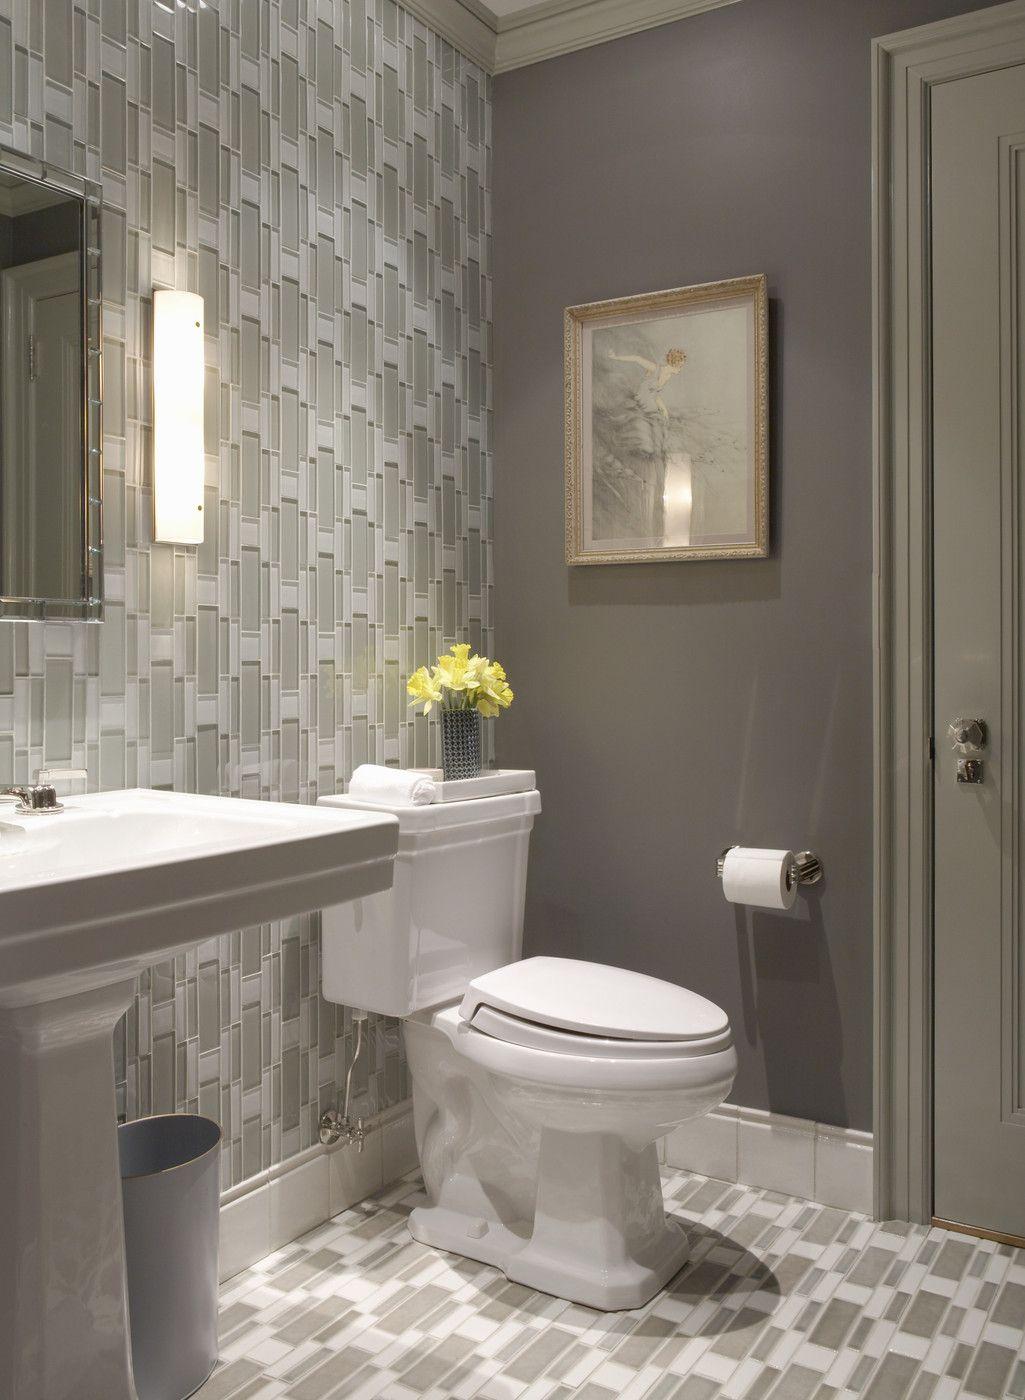 Warm Neutrals In A Sleek Bathroom Gray Bathroom Decor Bathroom Design Decor Bathroom Decor